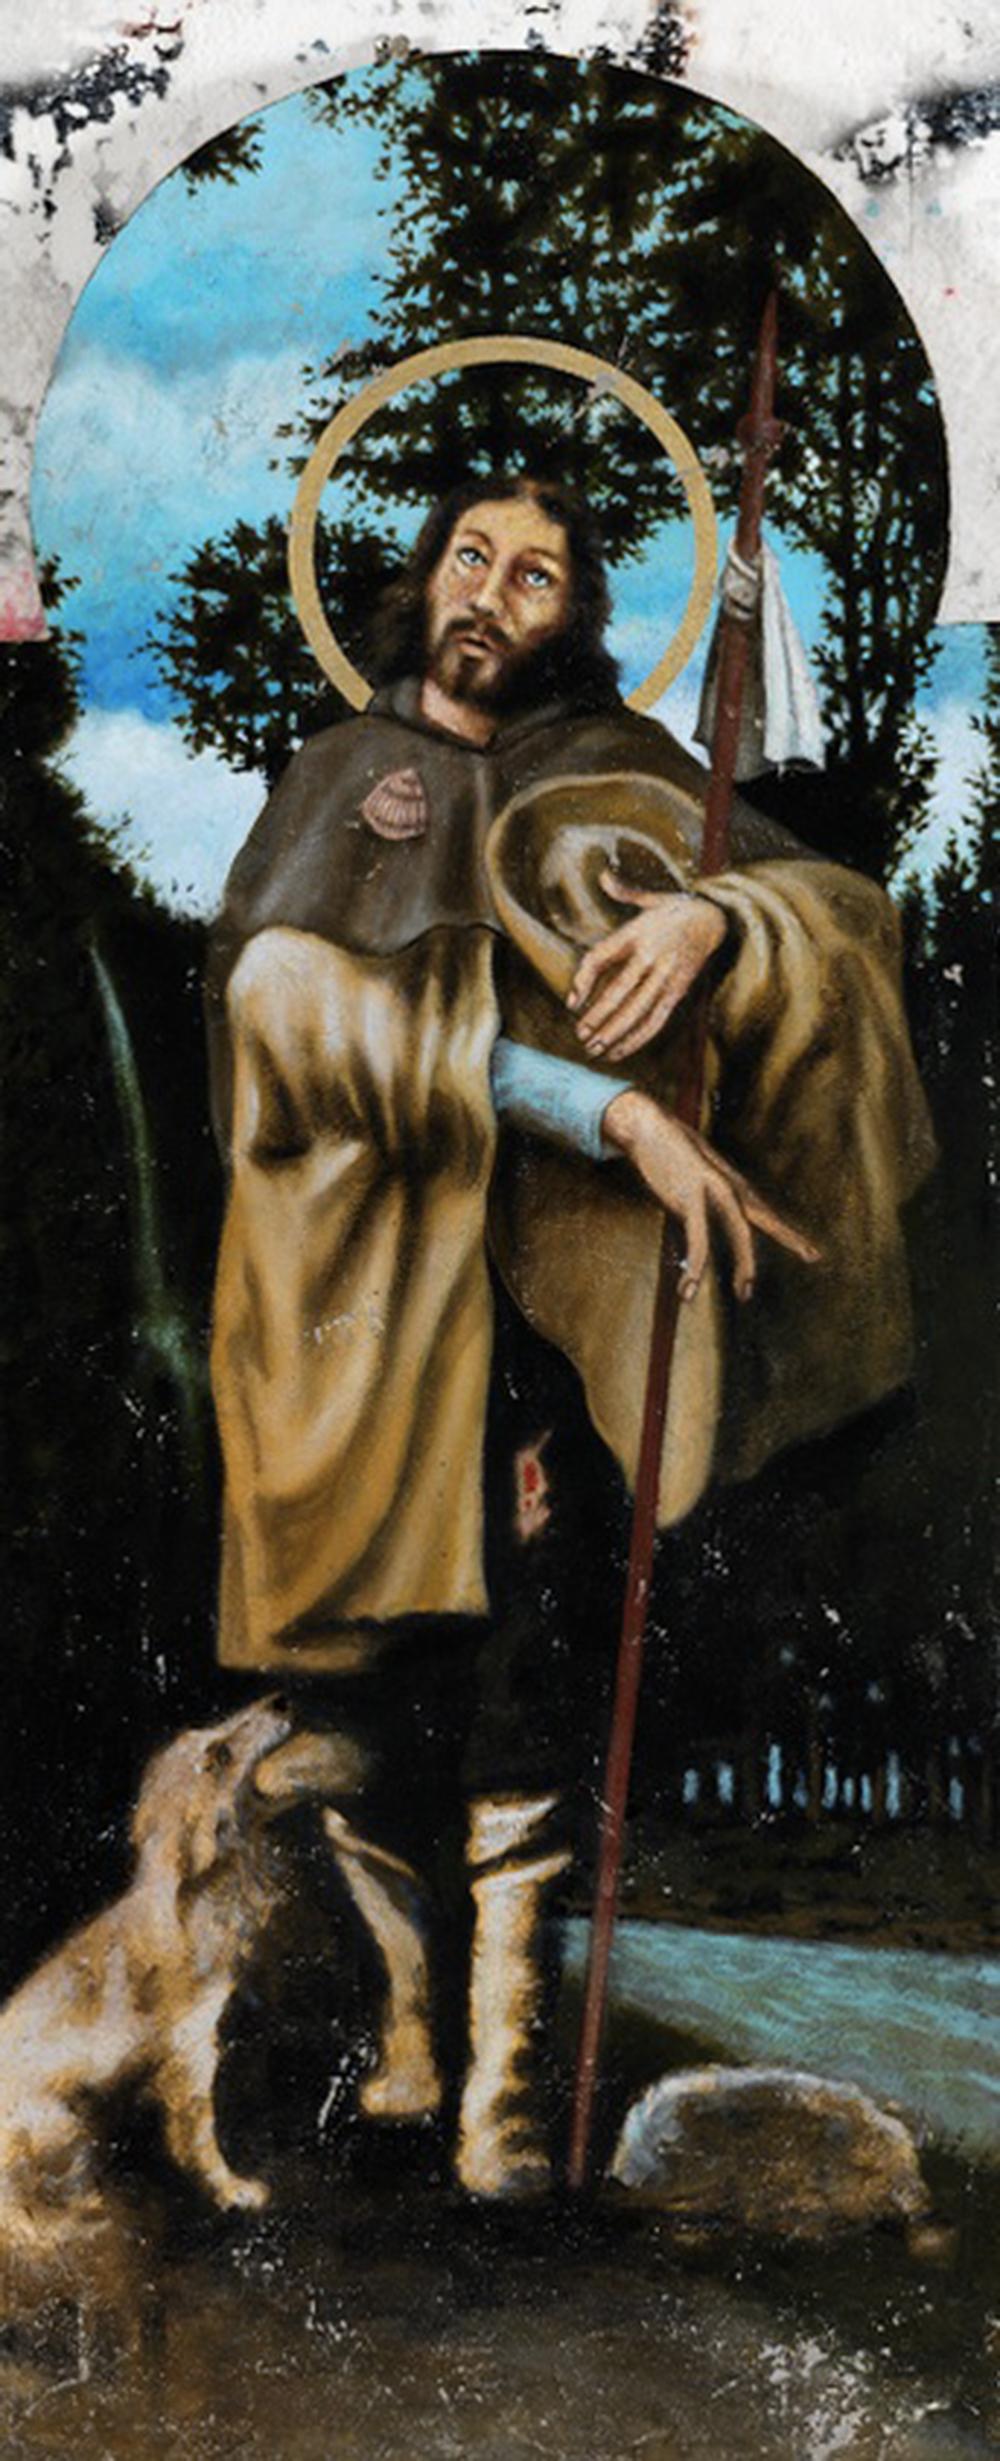 San Rocco (Muro 37), 2012, tecnica mista su tela, cm 118,5x50